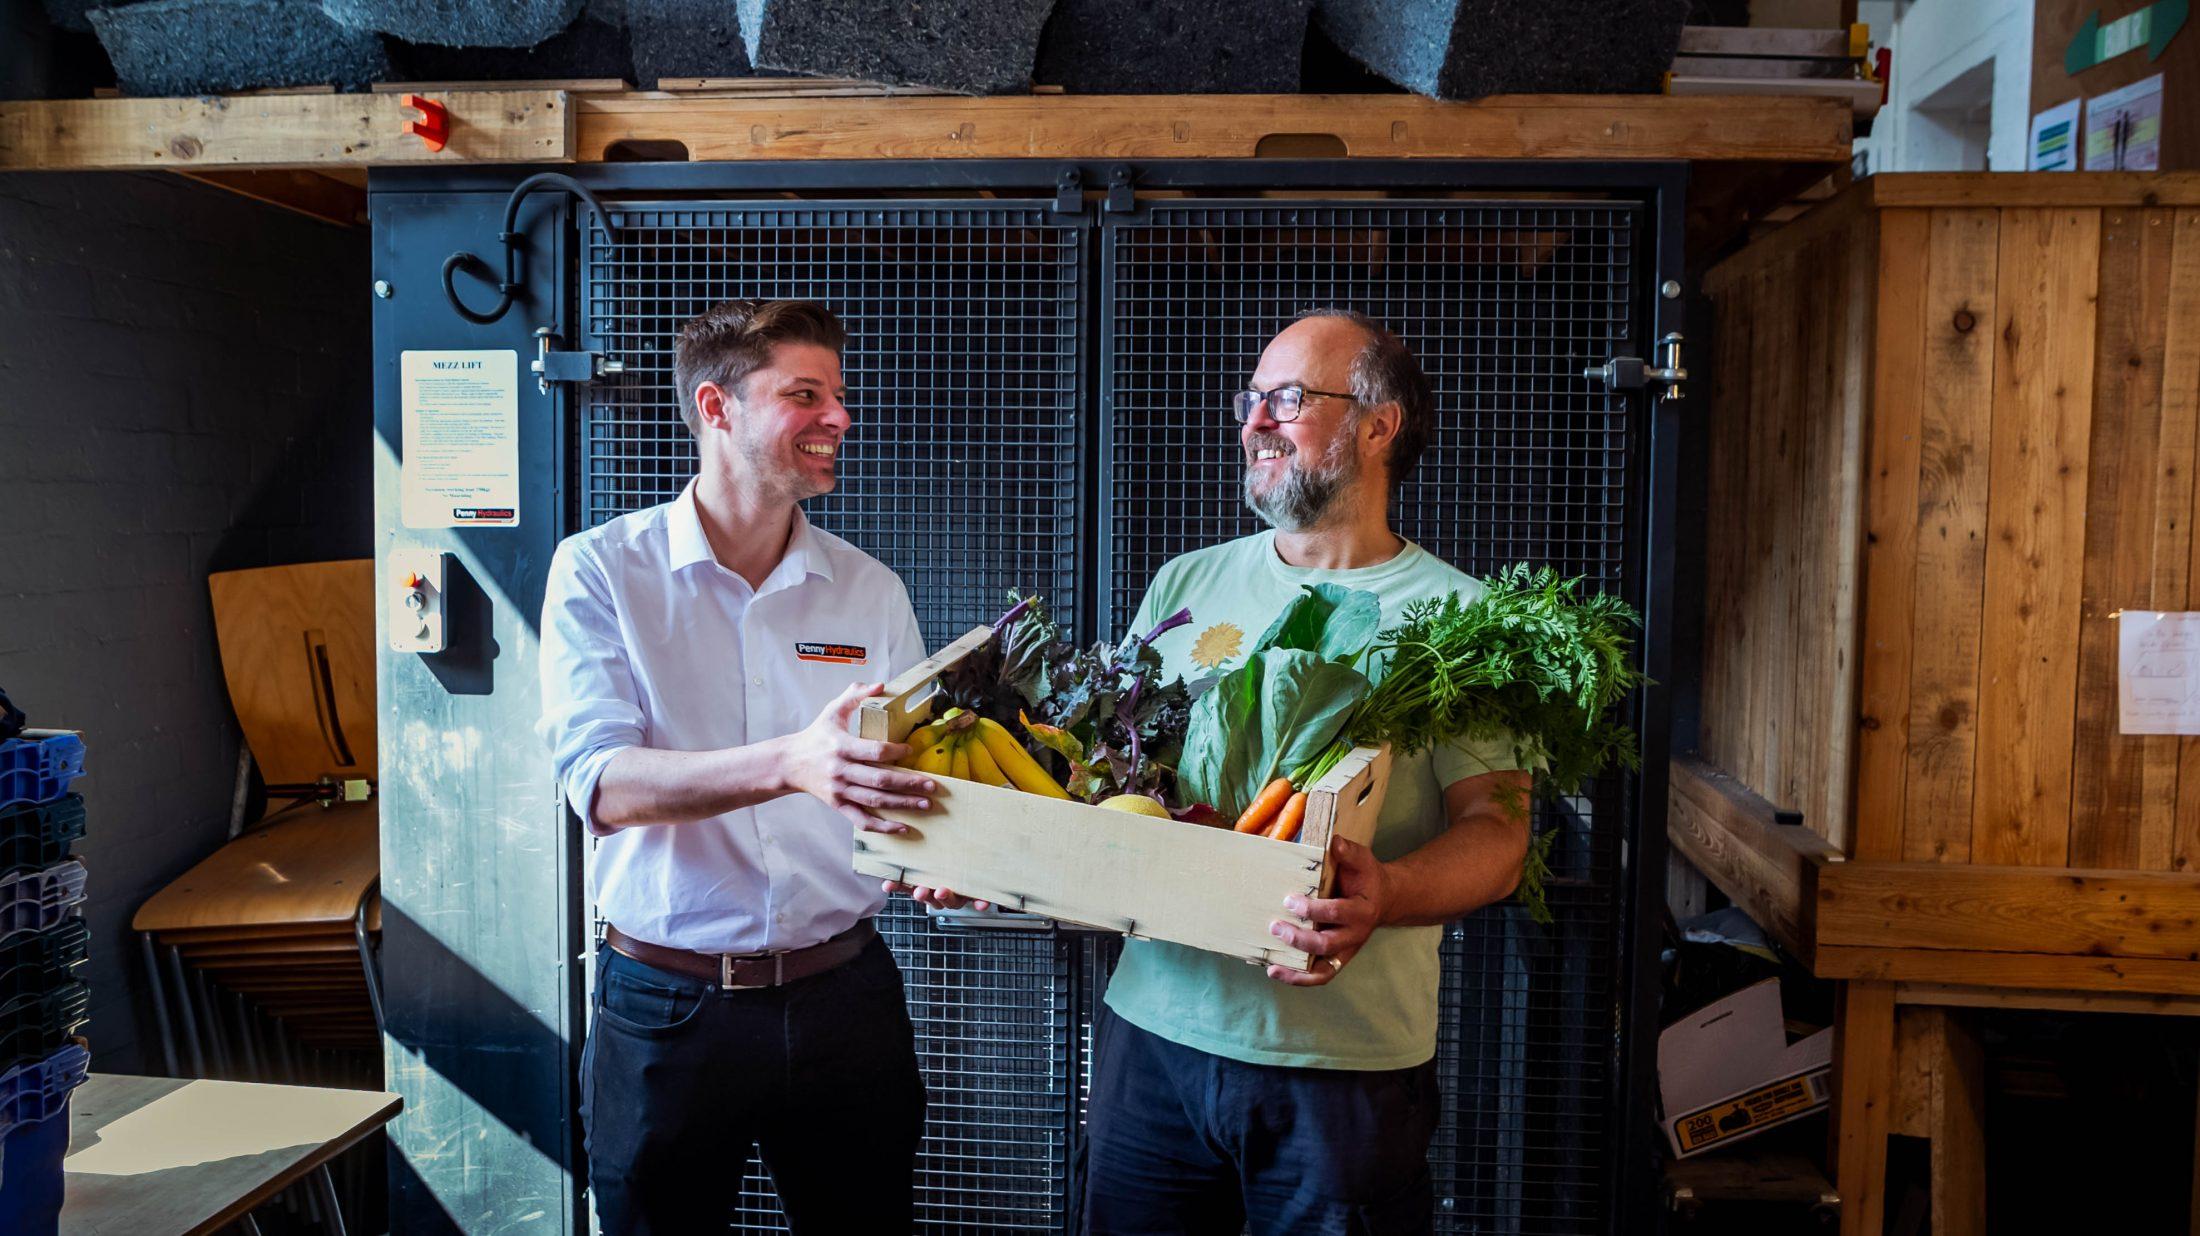 Men holding Vegetables